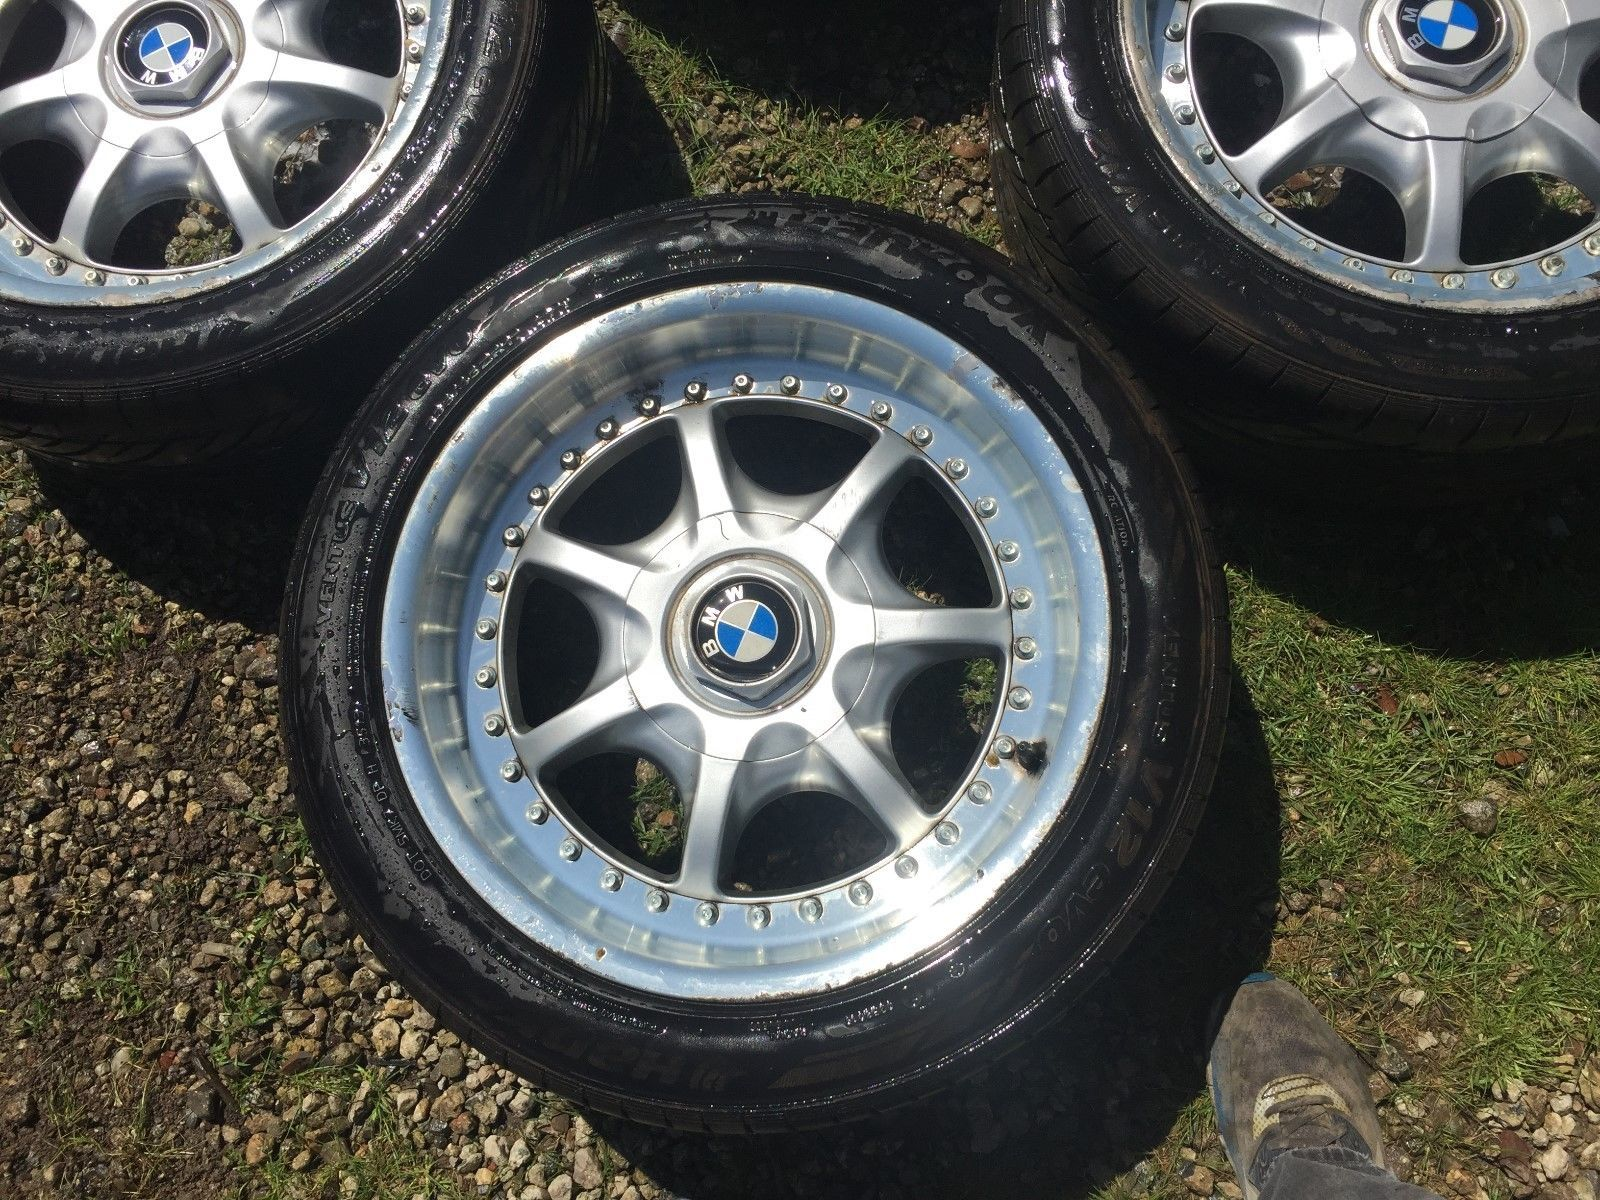 1997 2003 bmw e39 sport wheels rims 540i 530i 525i 528i 535i bbs deep dish 17 ebay [ 1600 x 1200 Pixel ]